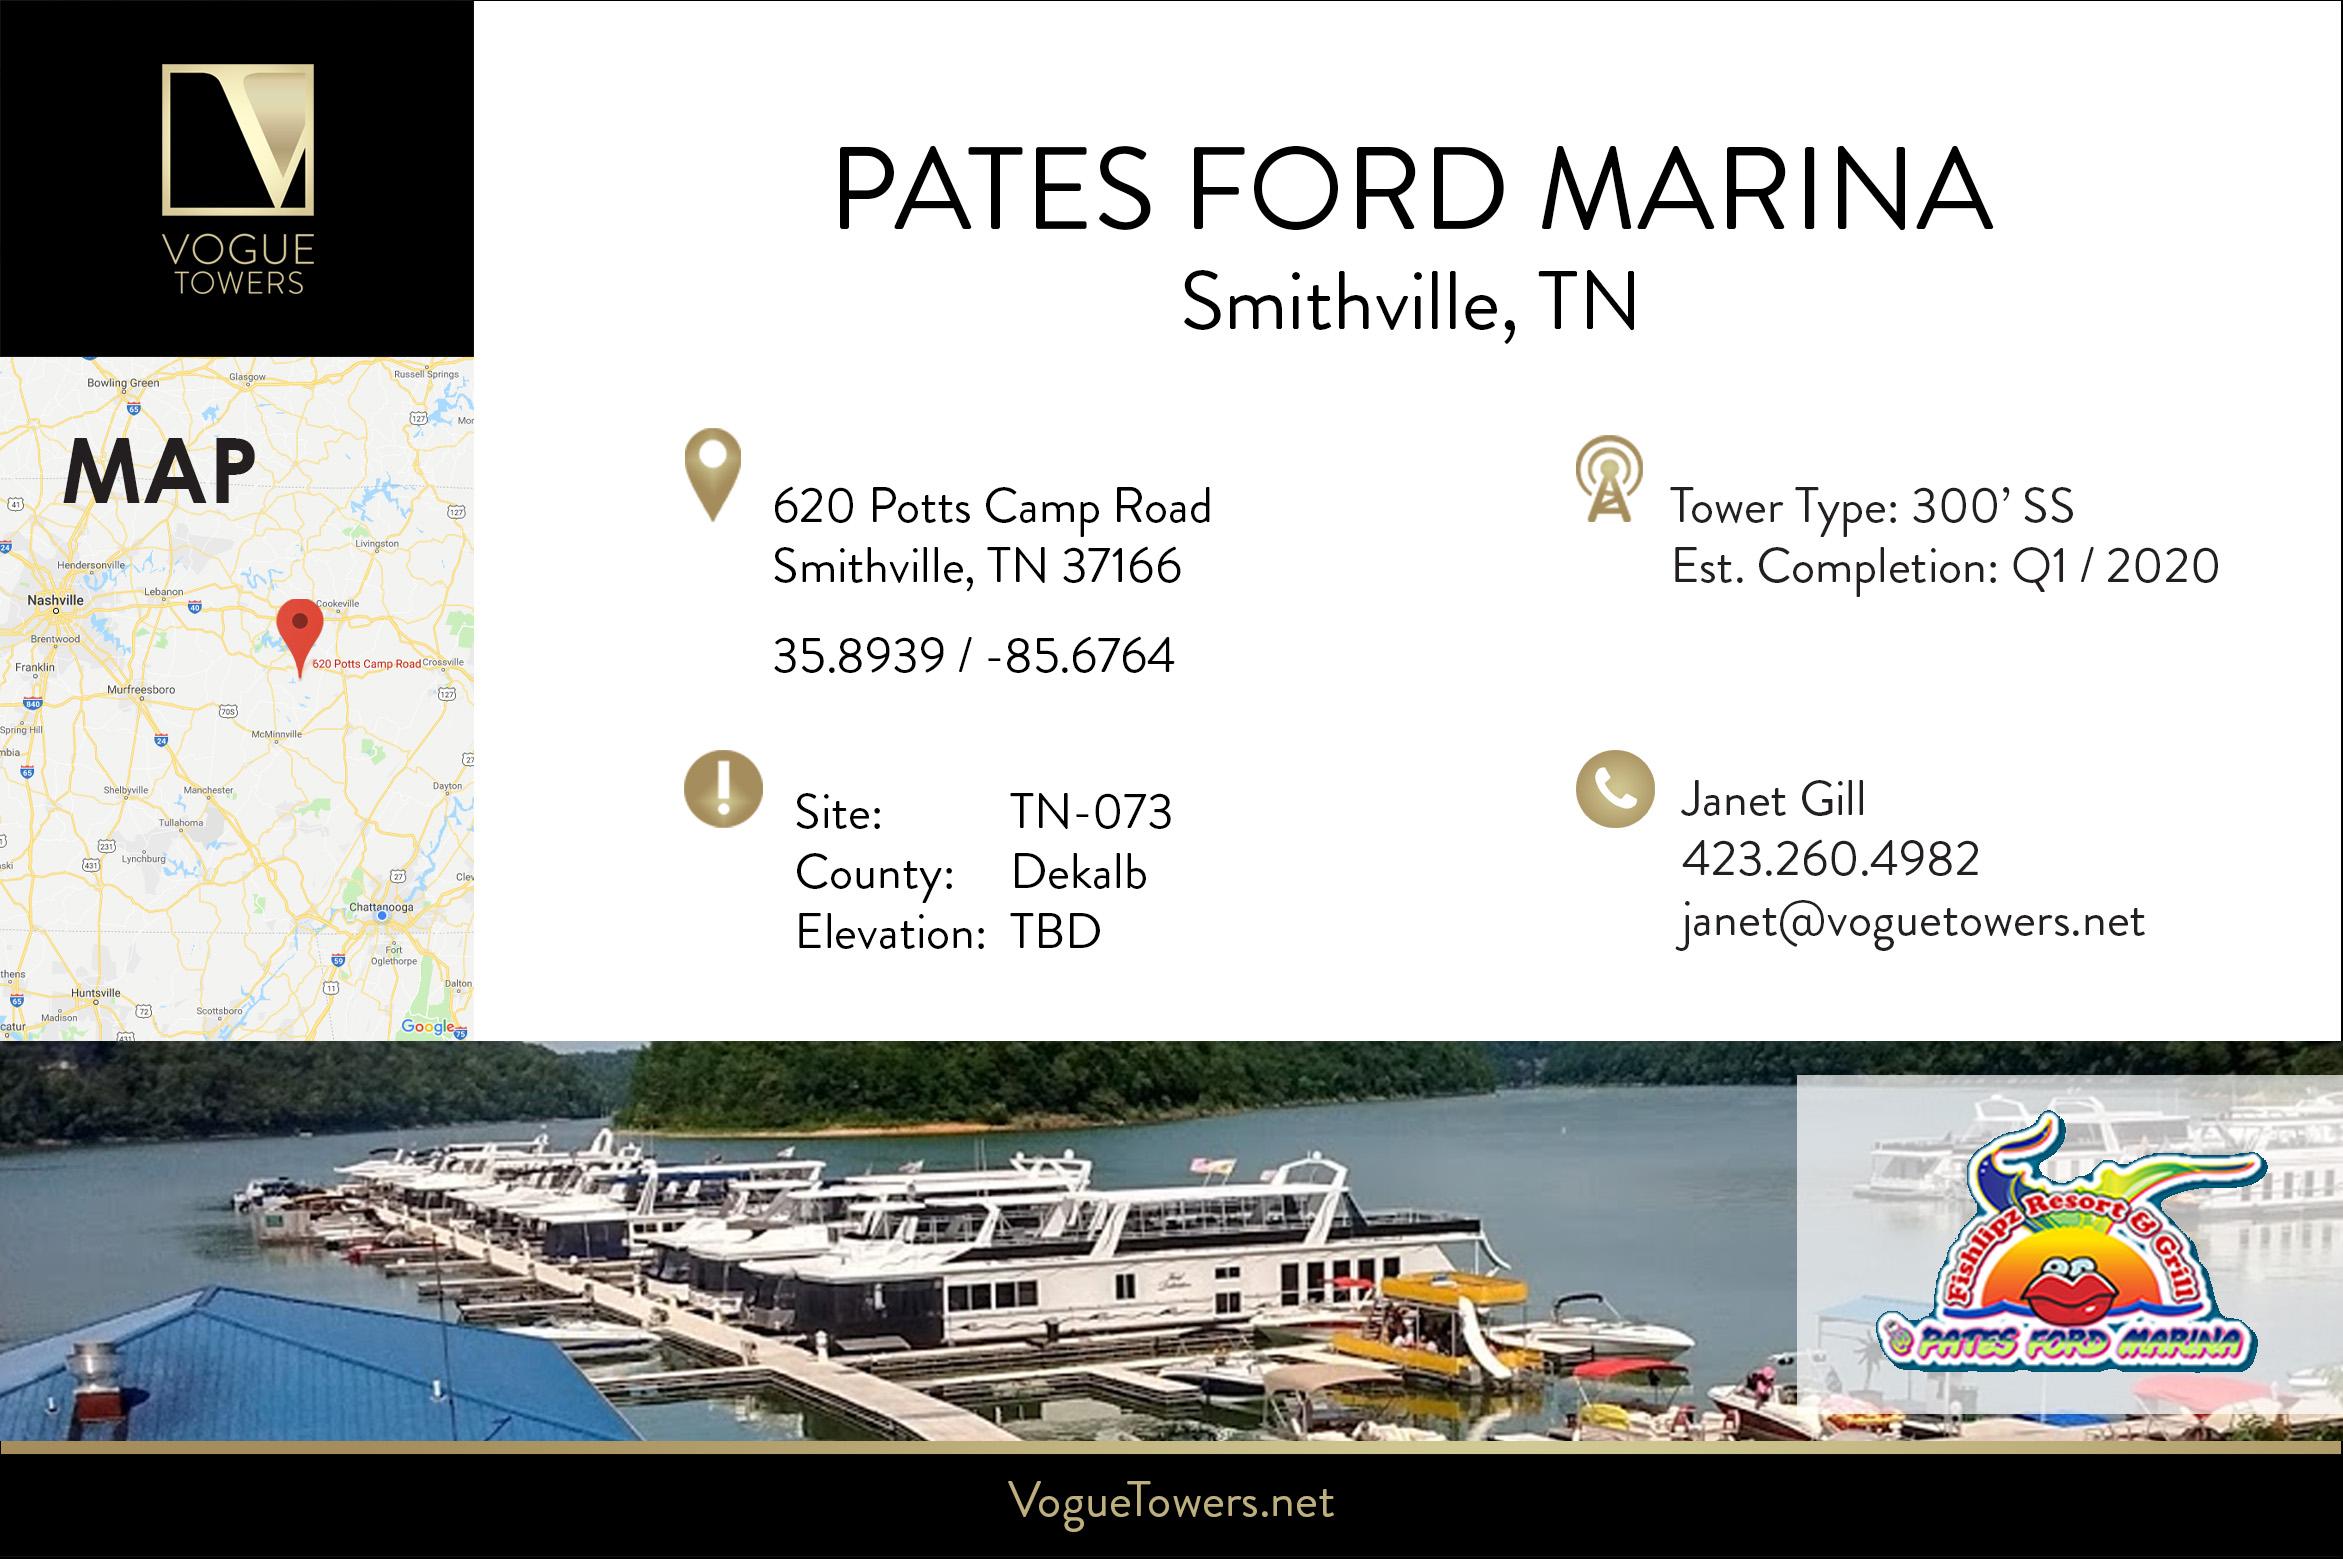 VT - Tower Sheet - Pates Ford Marina.jpg